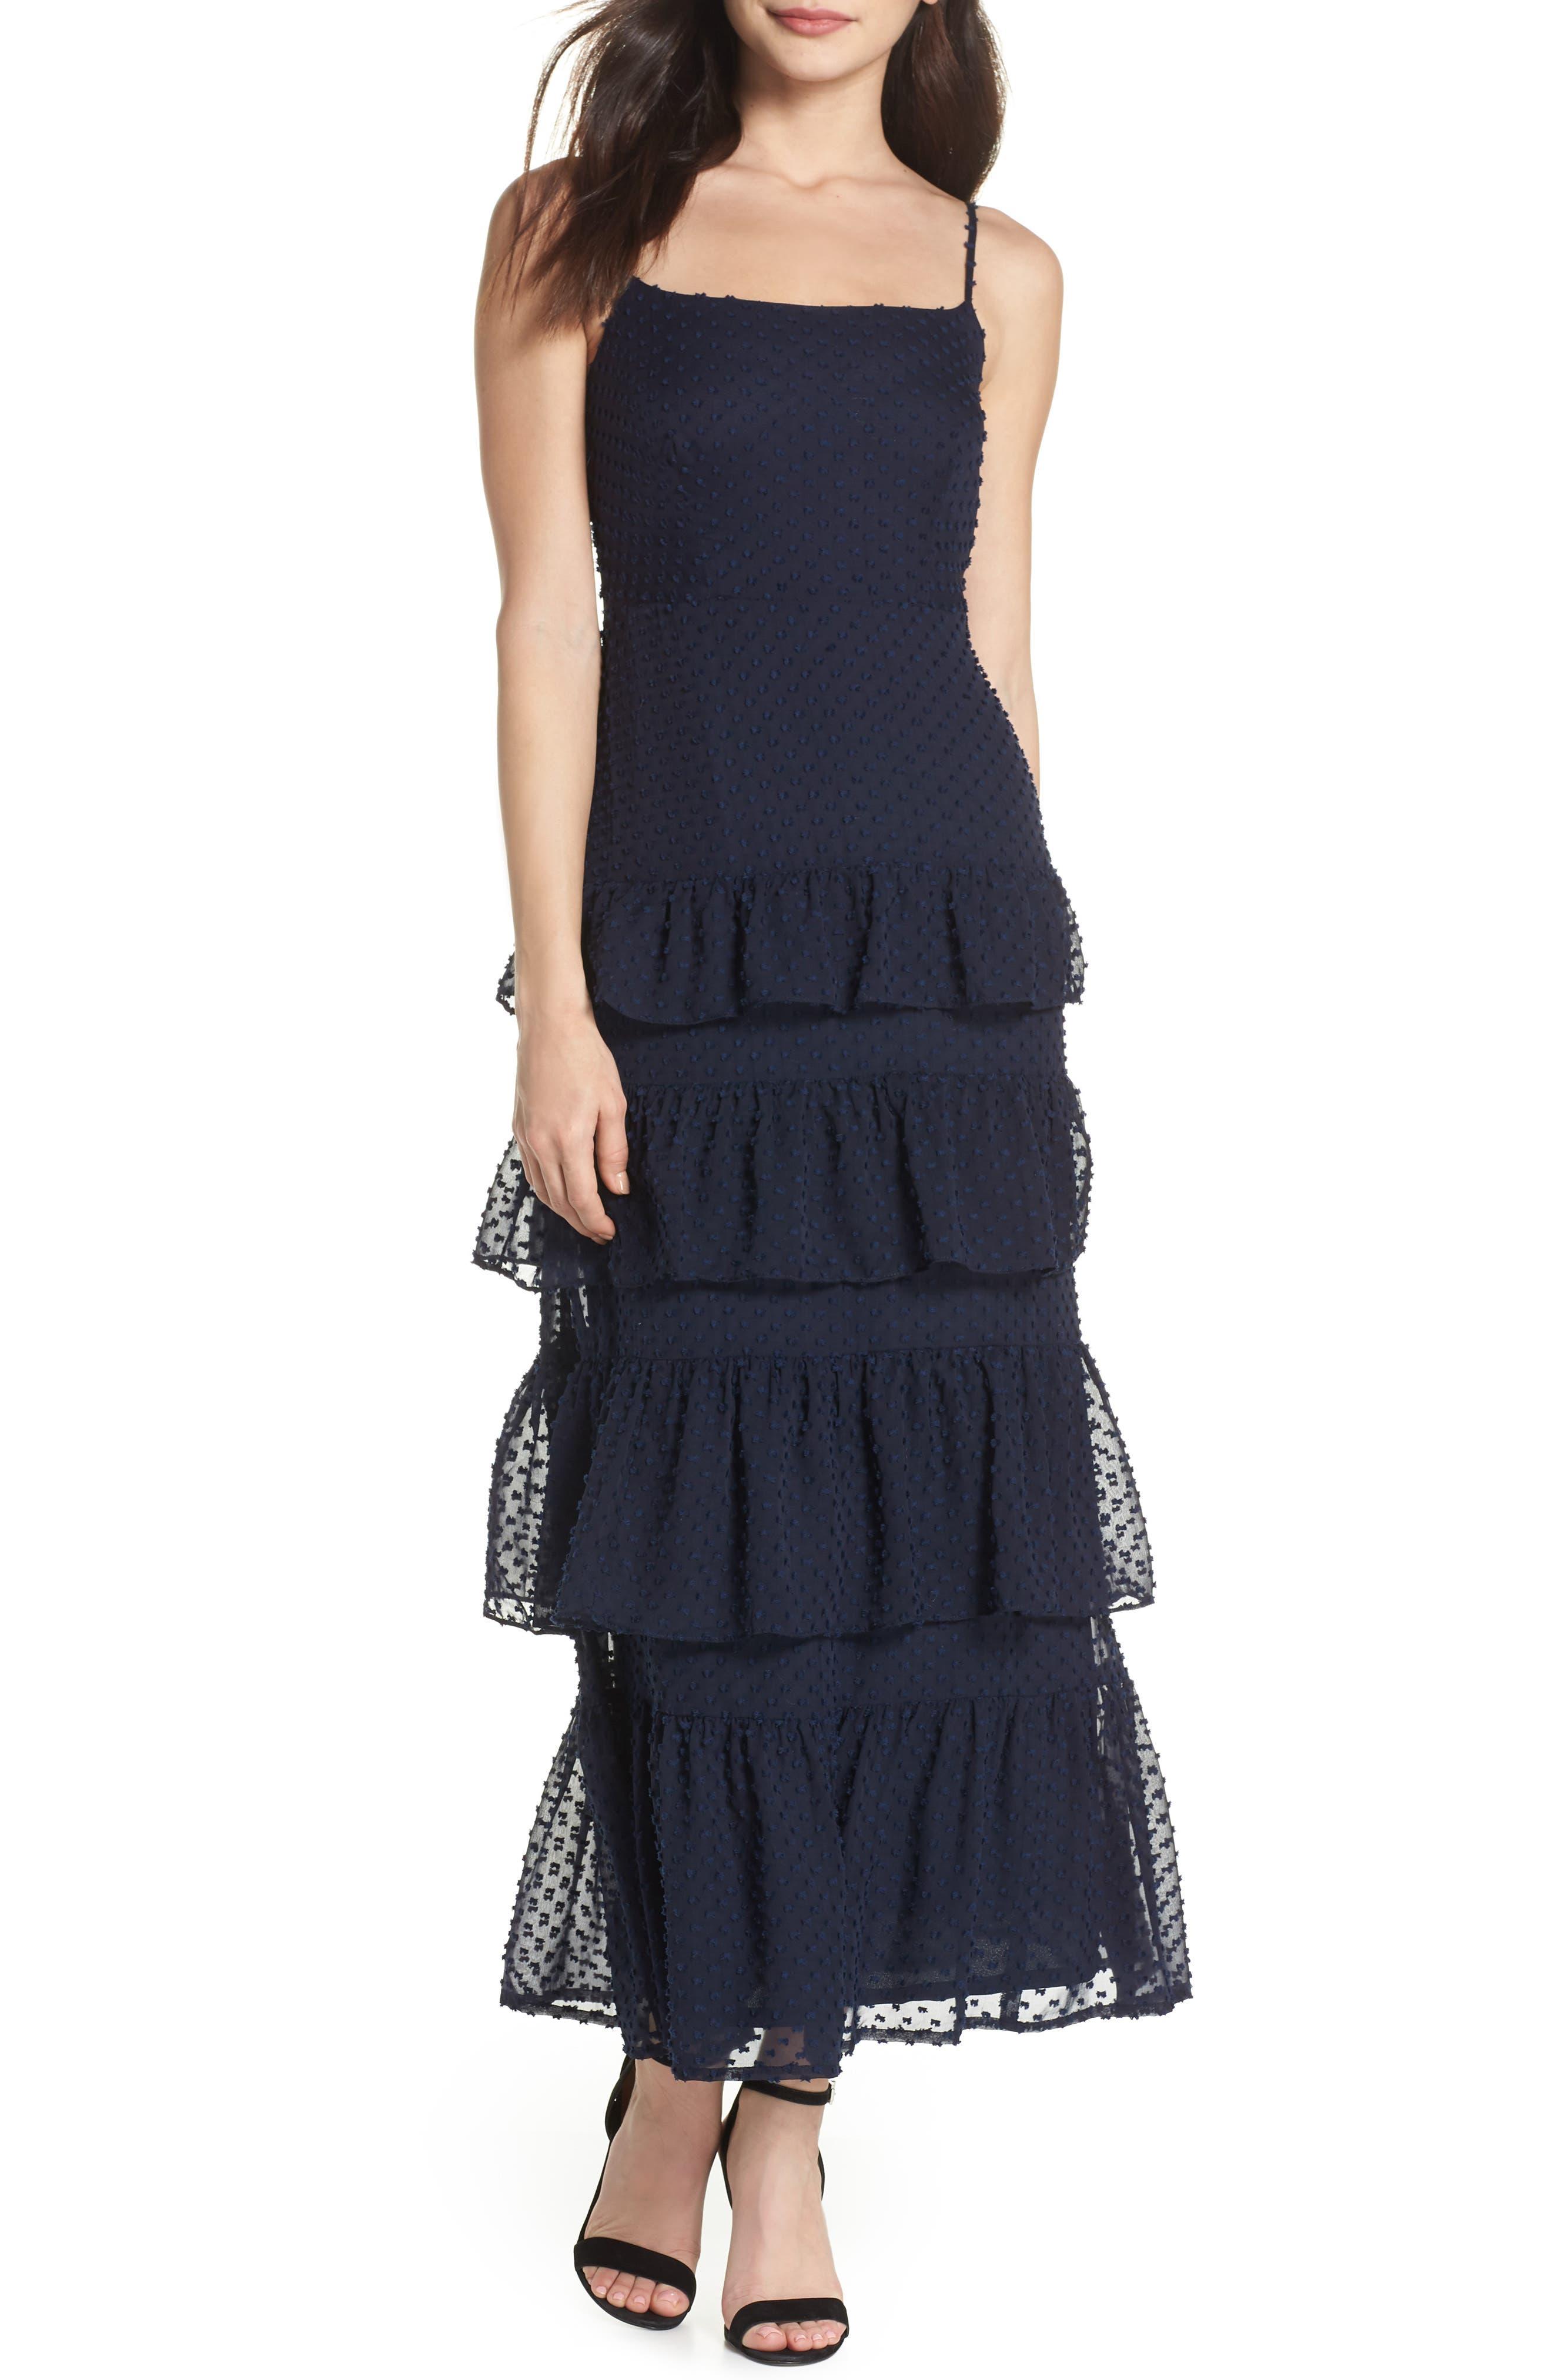 Alternate Image 1 Selected - J.Crew Dabble Dress (Nordstrom Exclusive)